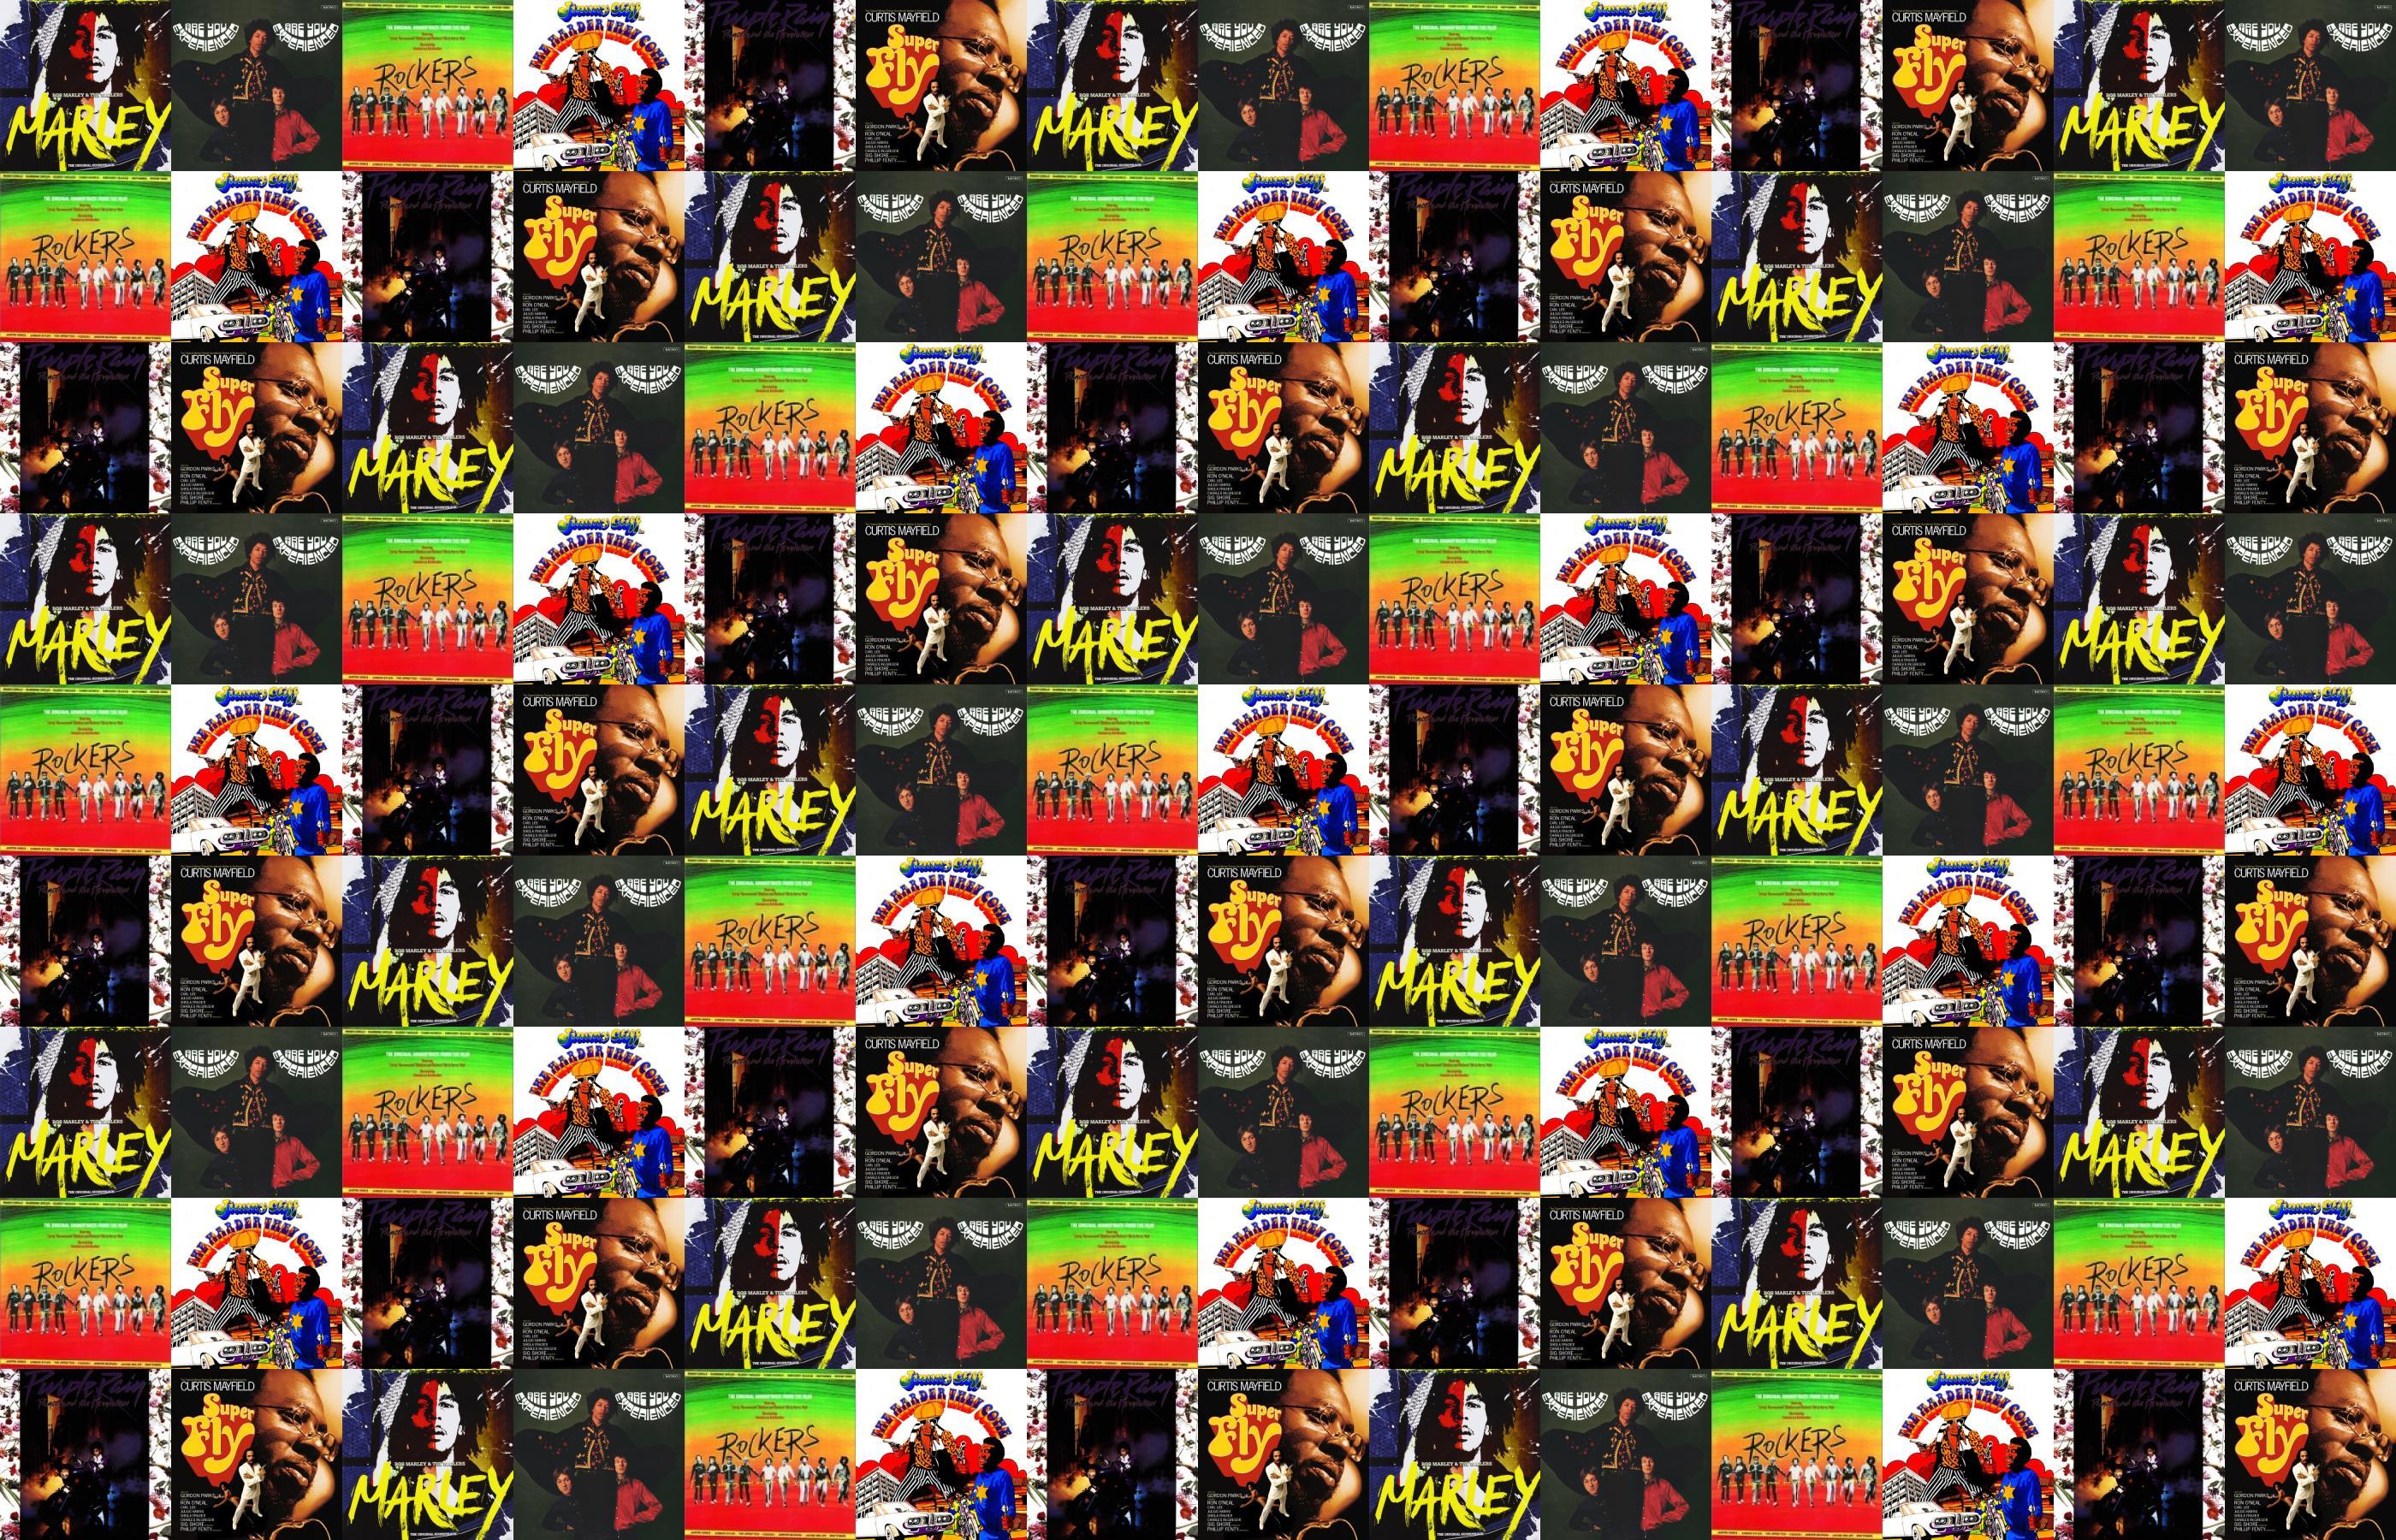 Jimi hendrix experience full album